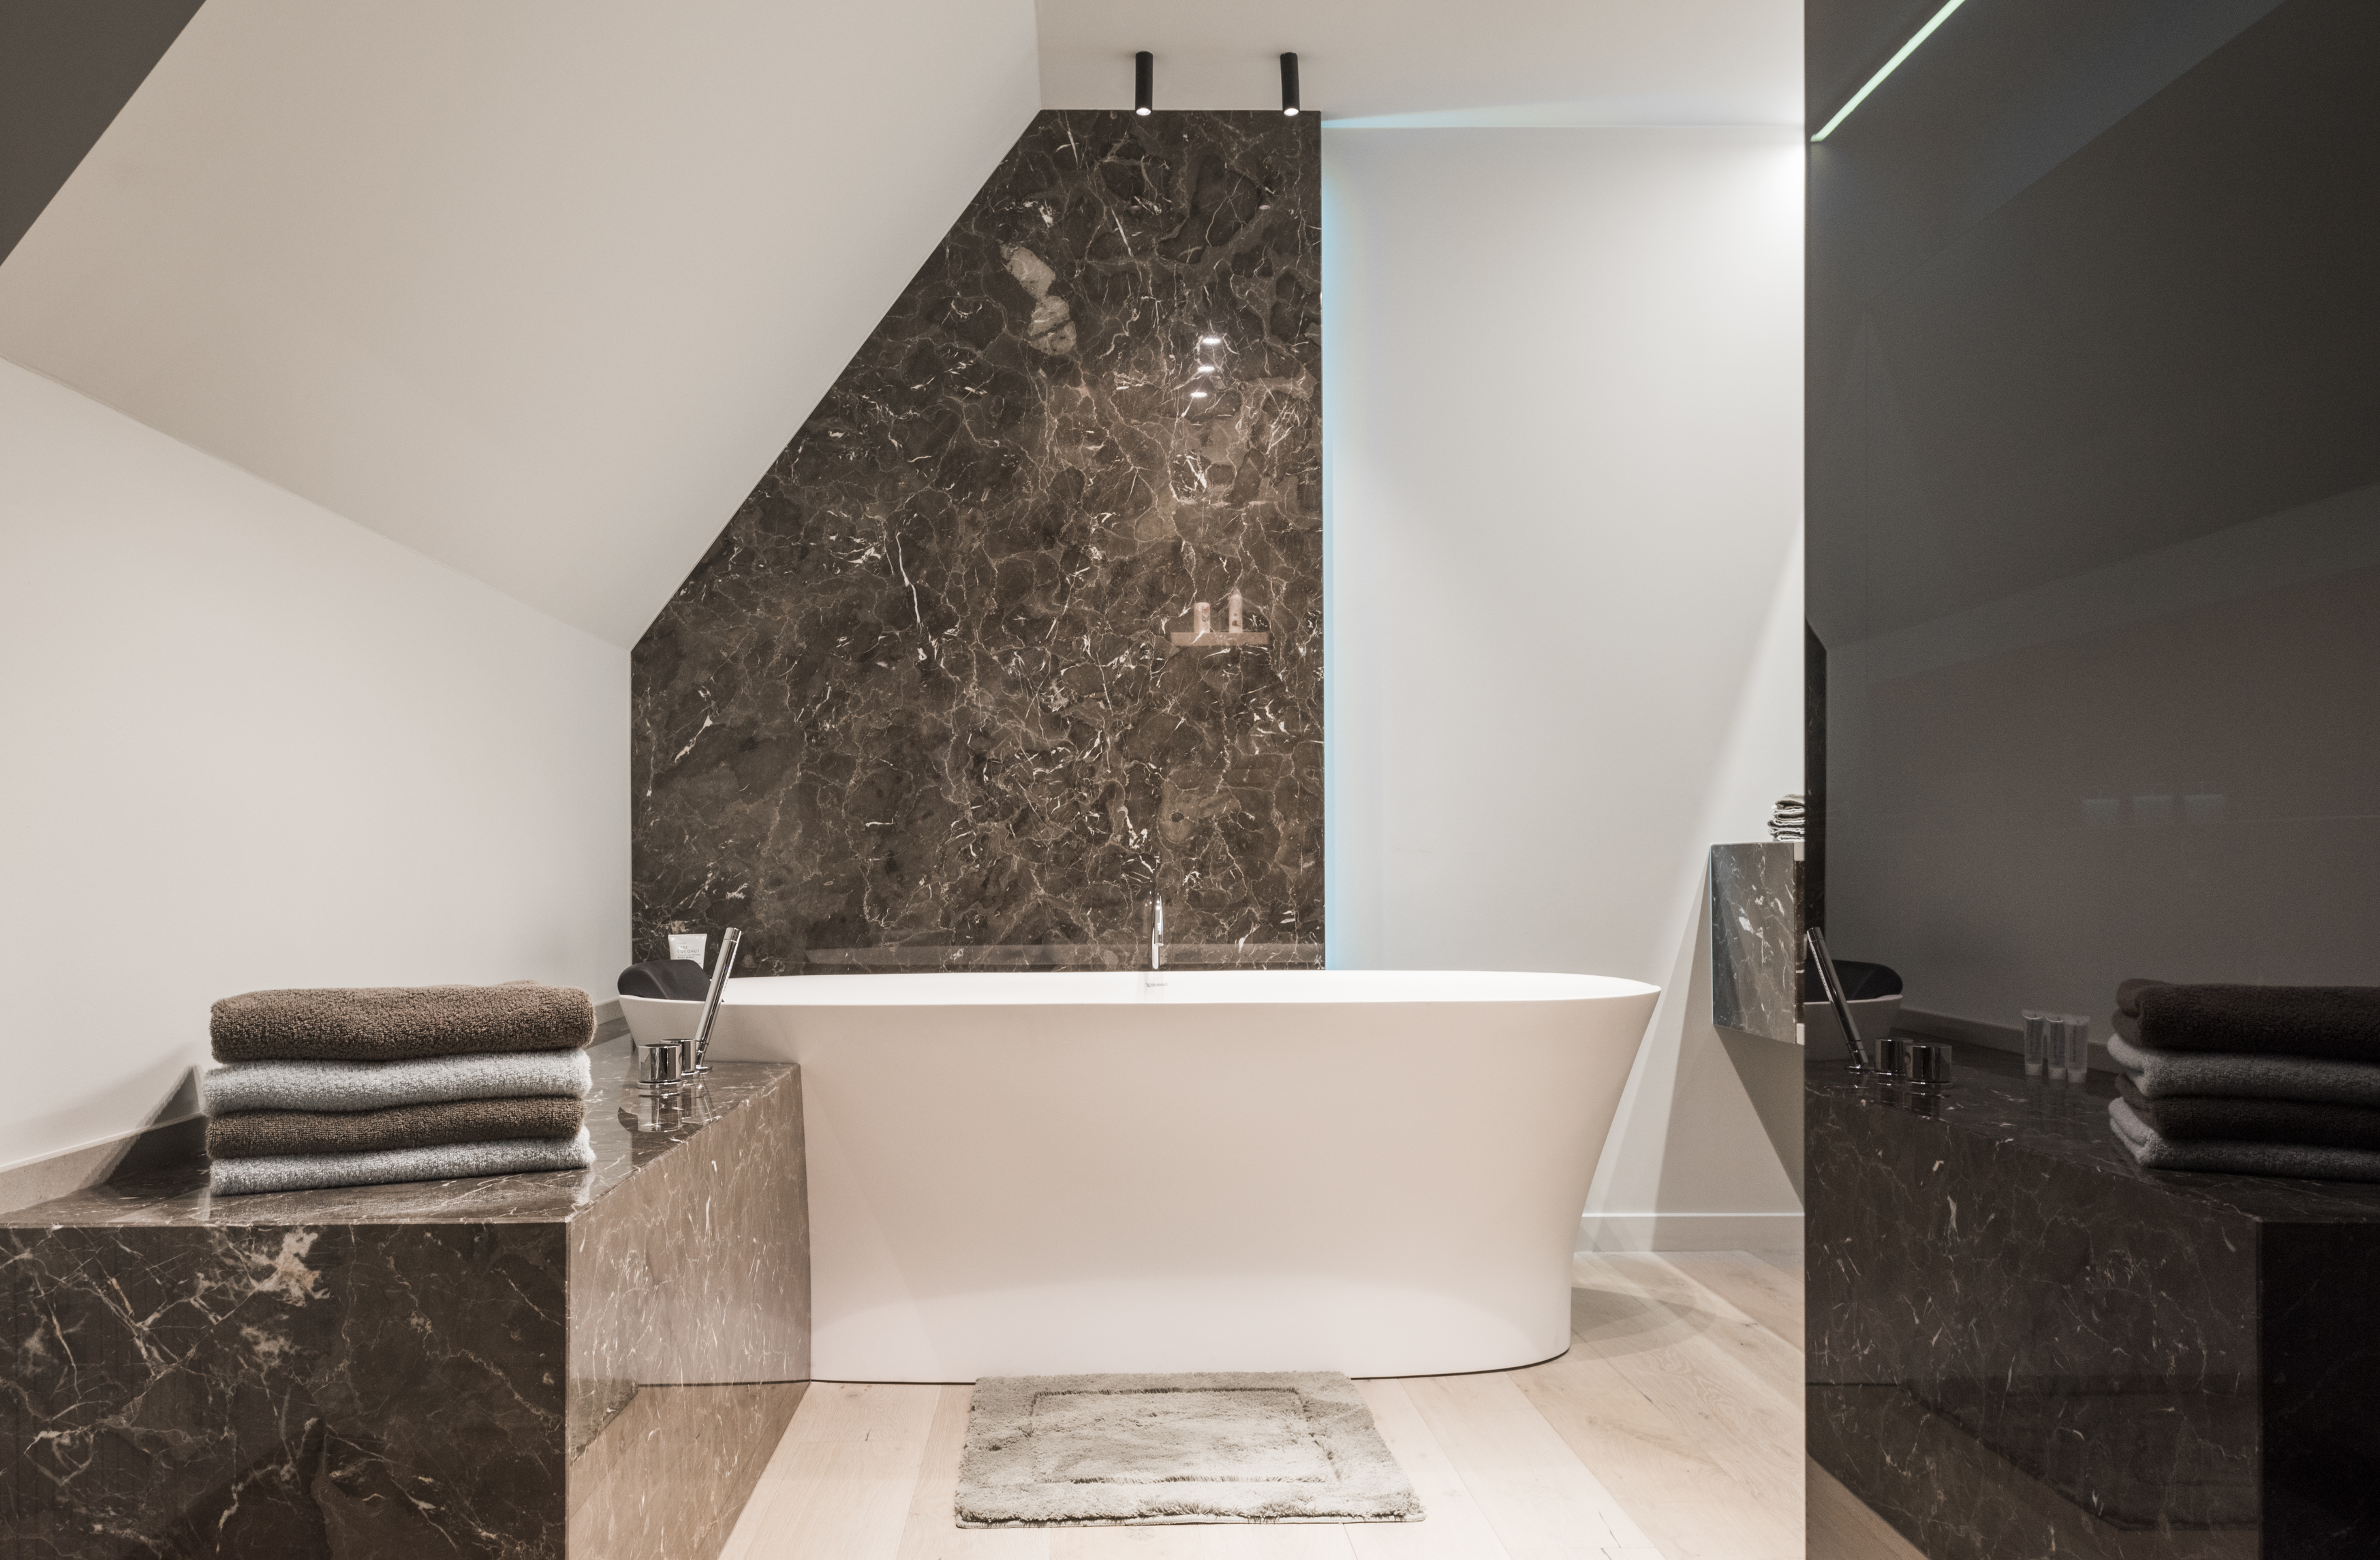 Beltrami natuursteen natural stone design modern badkamer